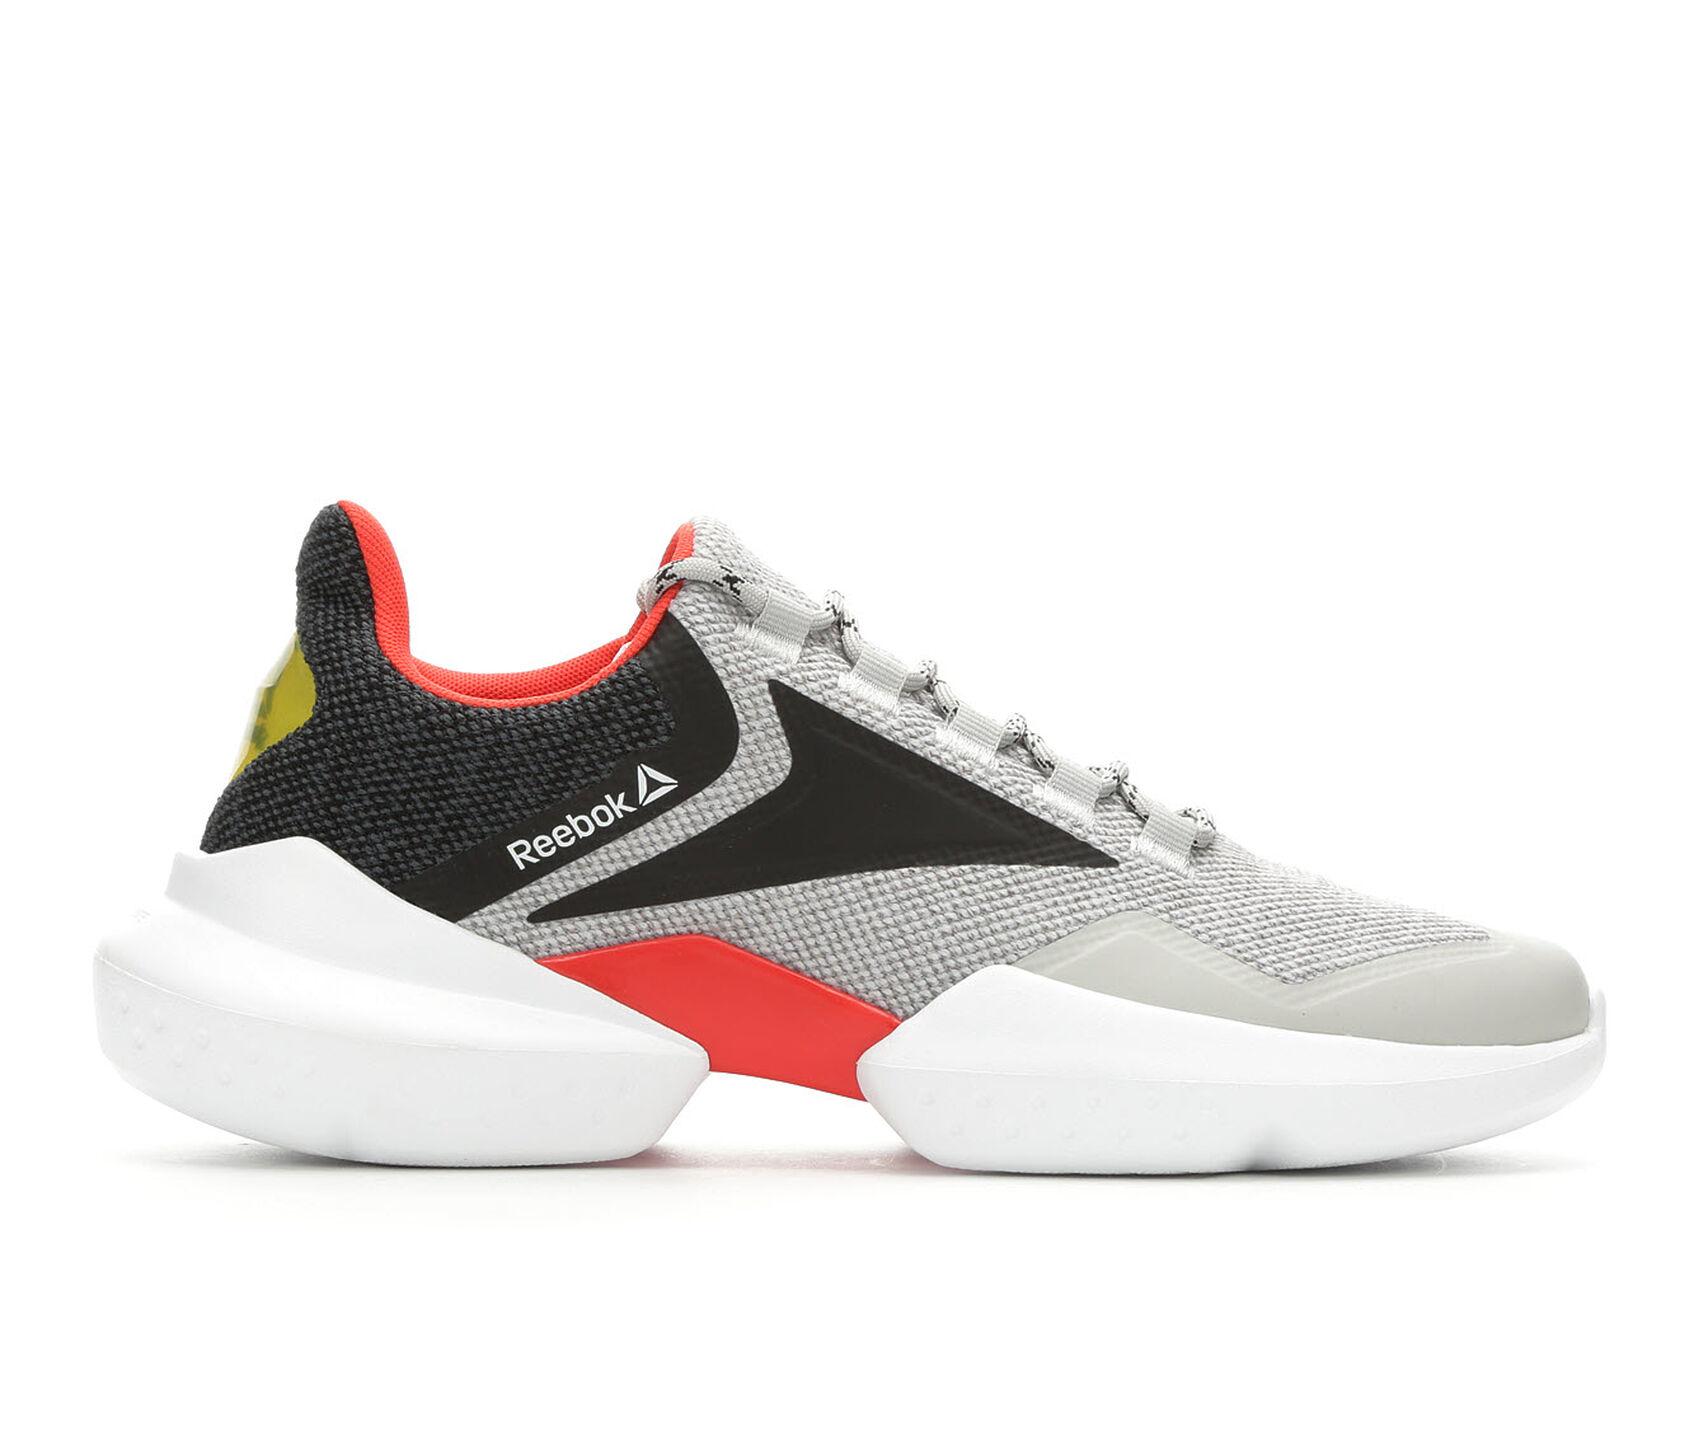 e61df23d1fc ... Reebok Split Fuel Sneakers. Previous